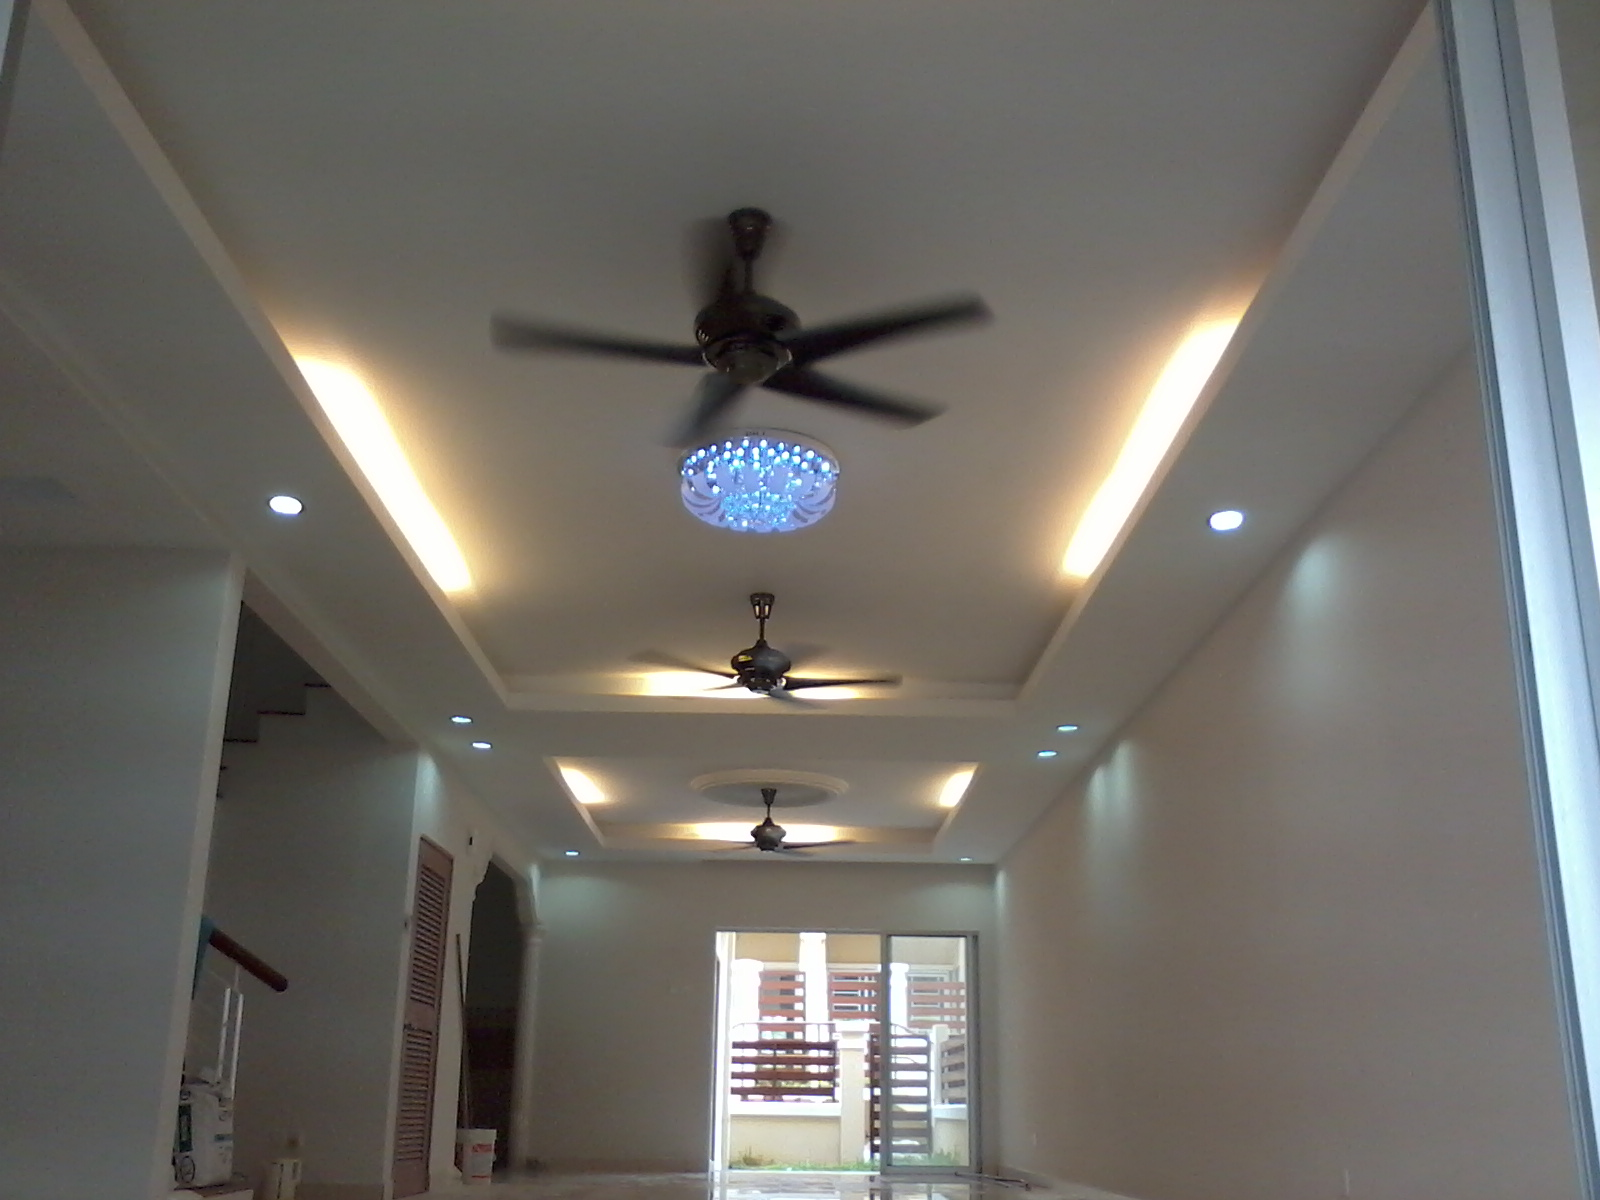 Plaster Siling Specialist Ceiling Sbdice A Moden Dan Pencahayaan Ruang Tamu Di Denai Alam